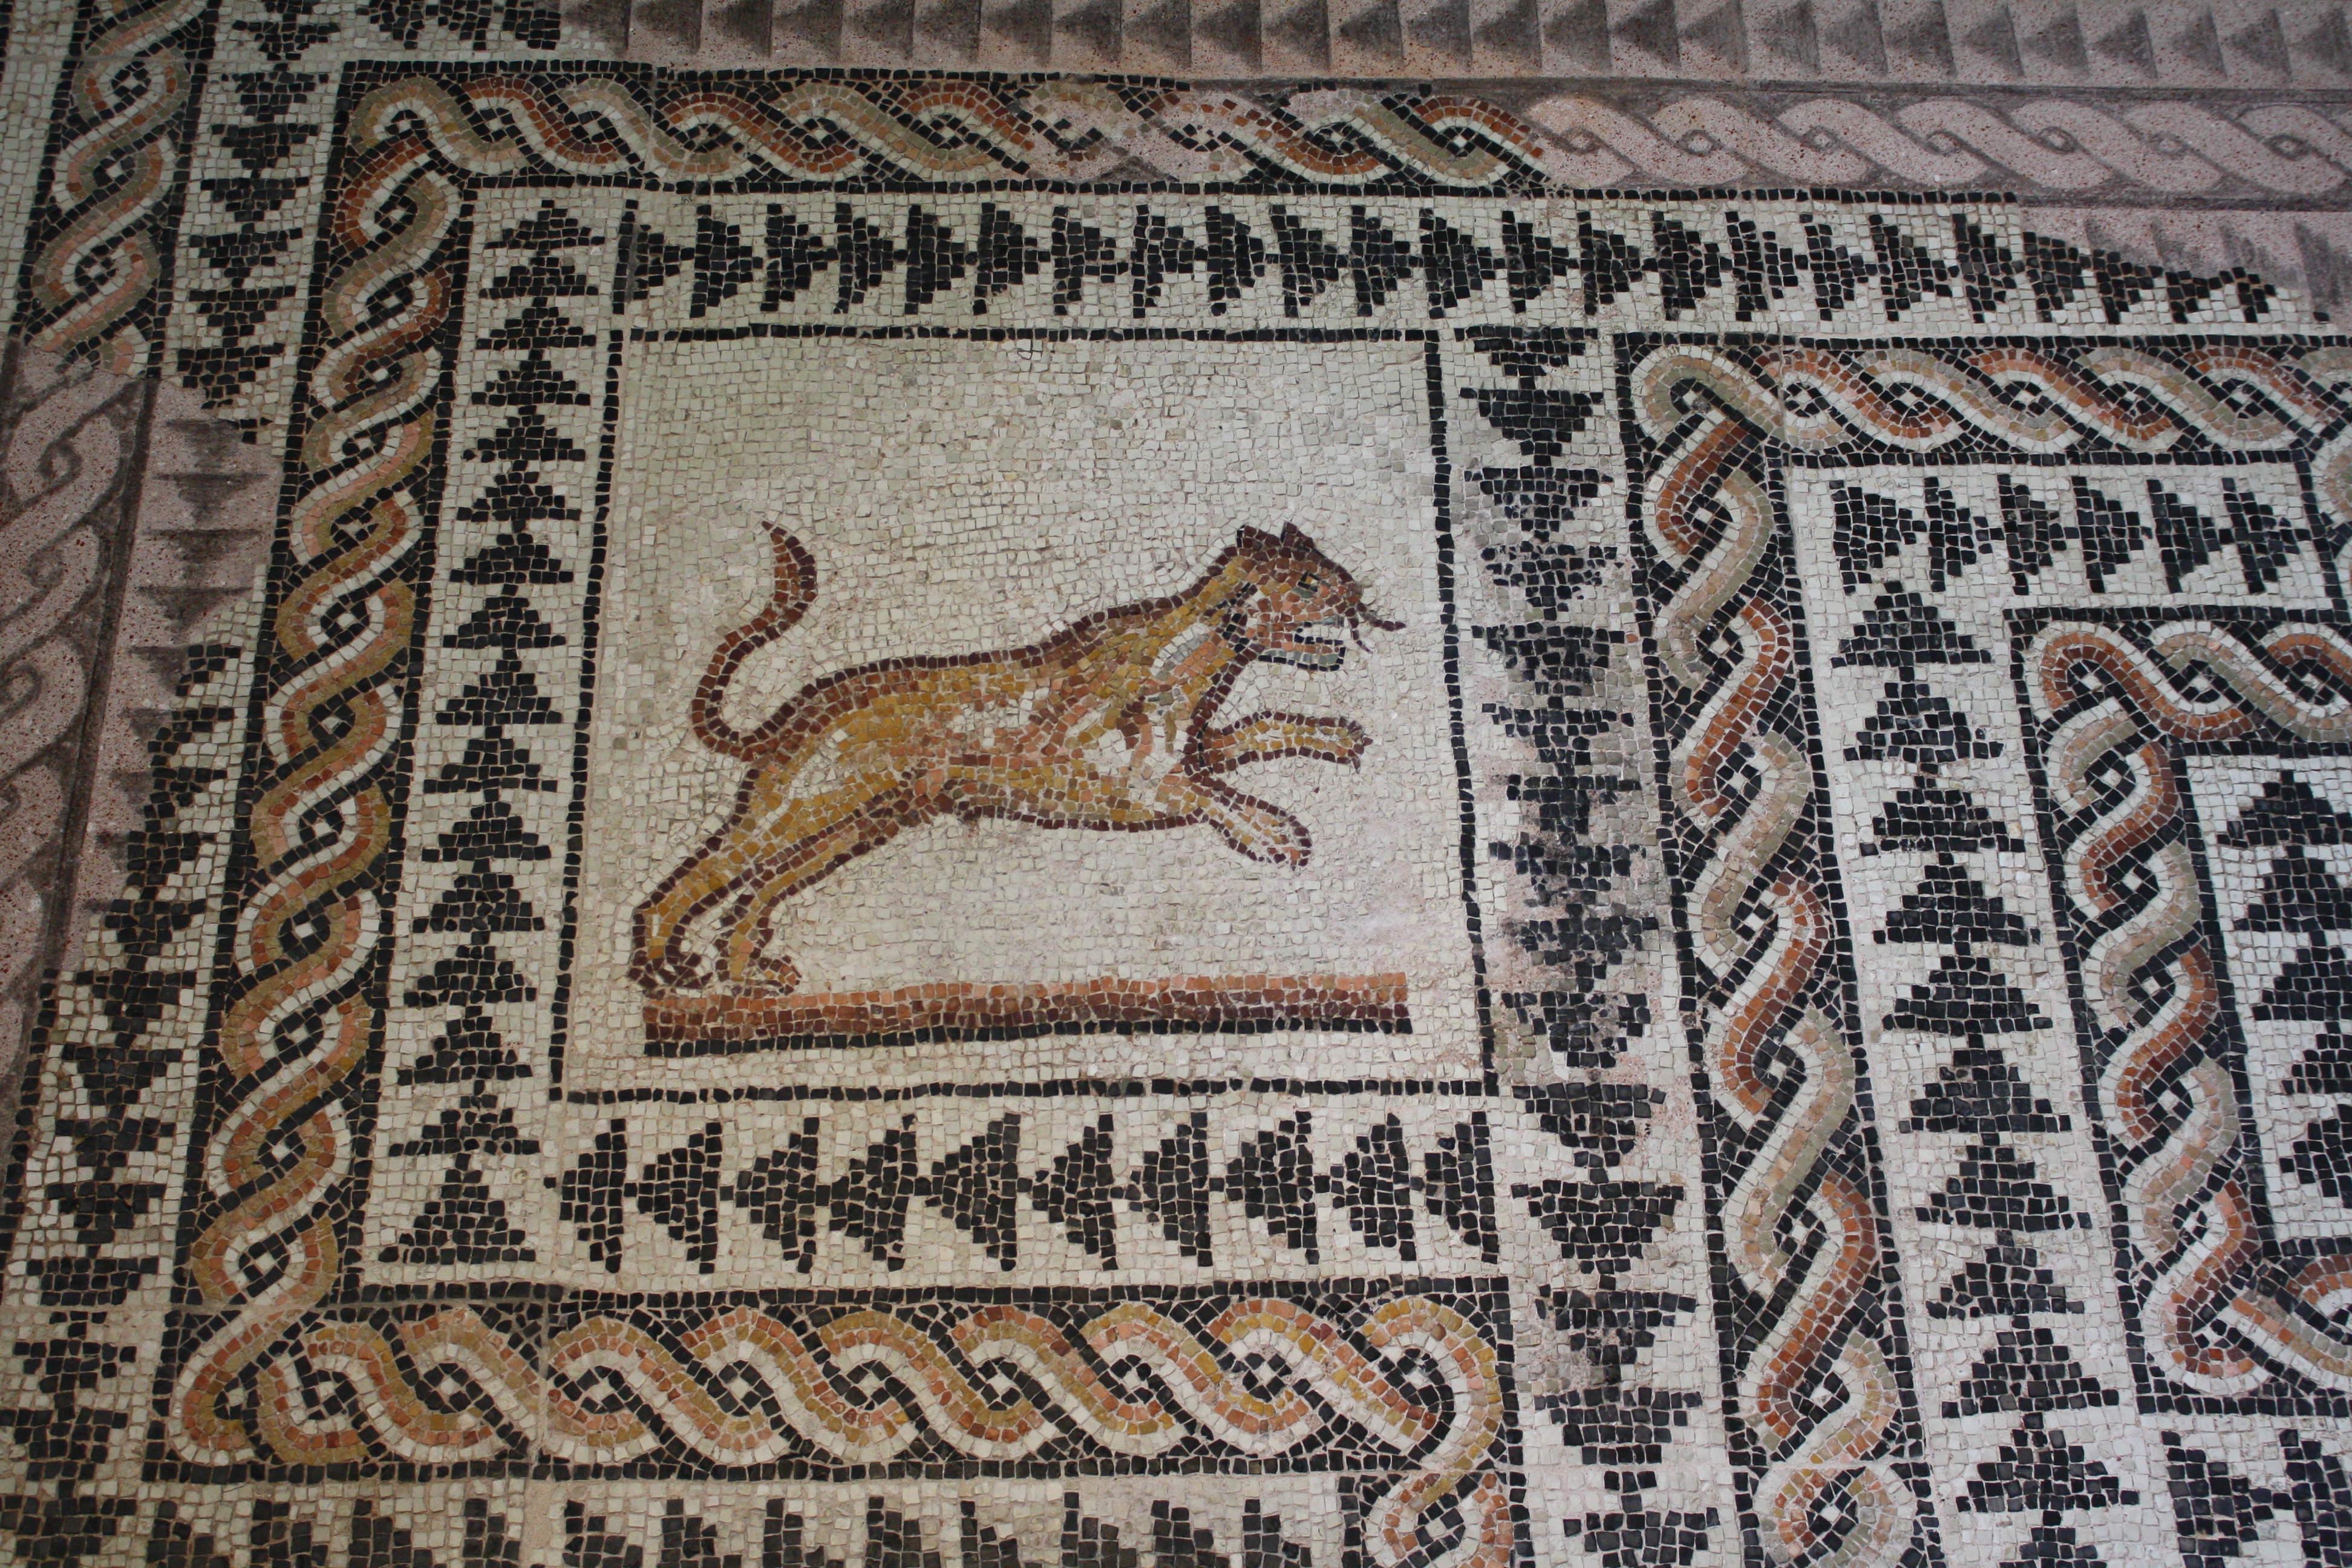 Roman Mosaic Illustration Ancient History Encyclopedia